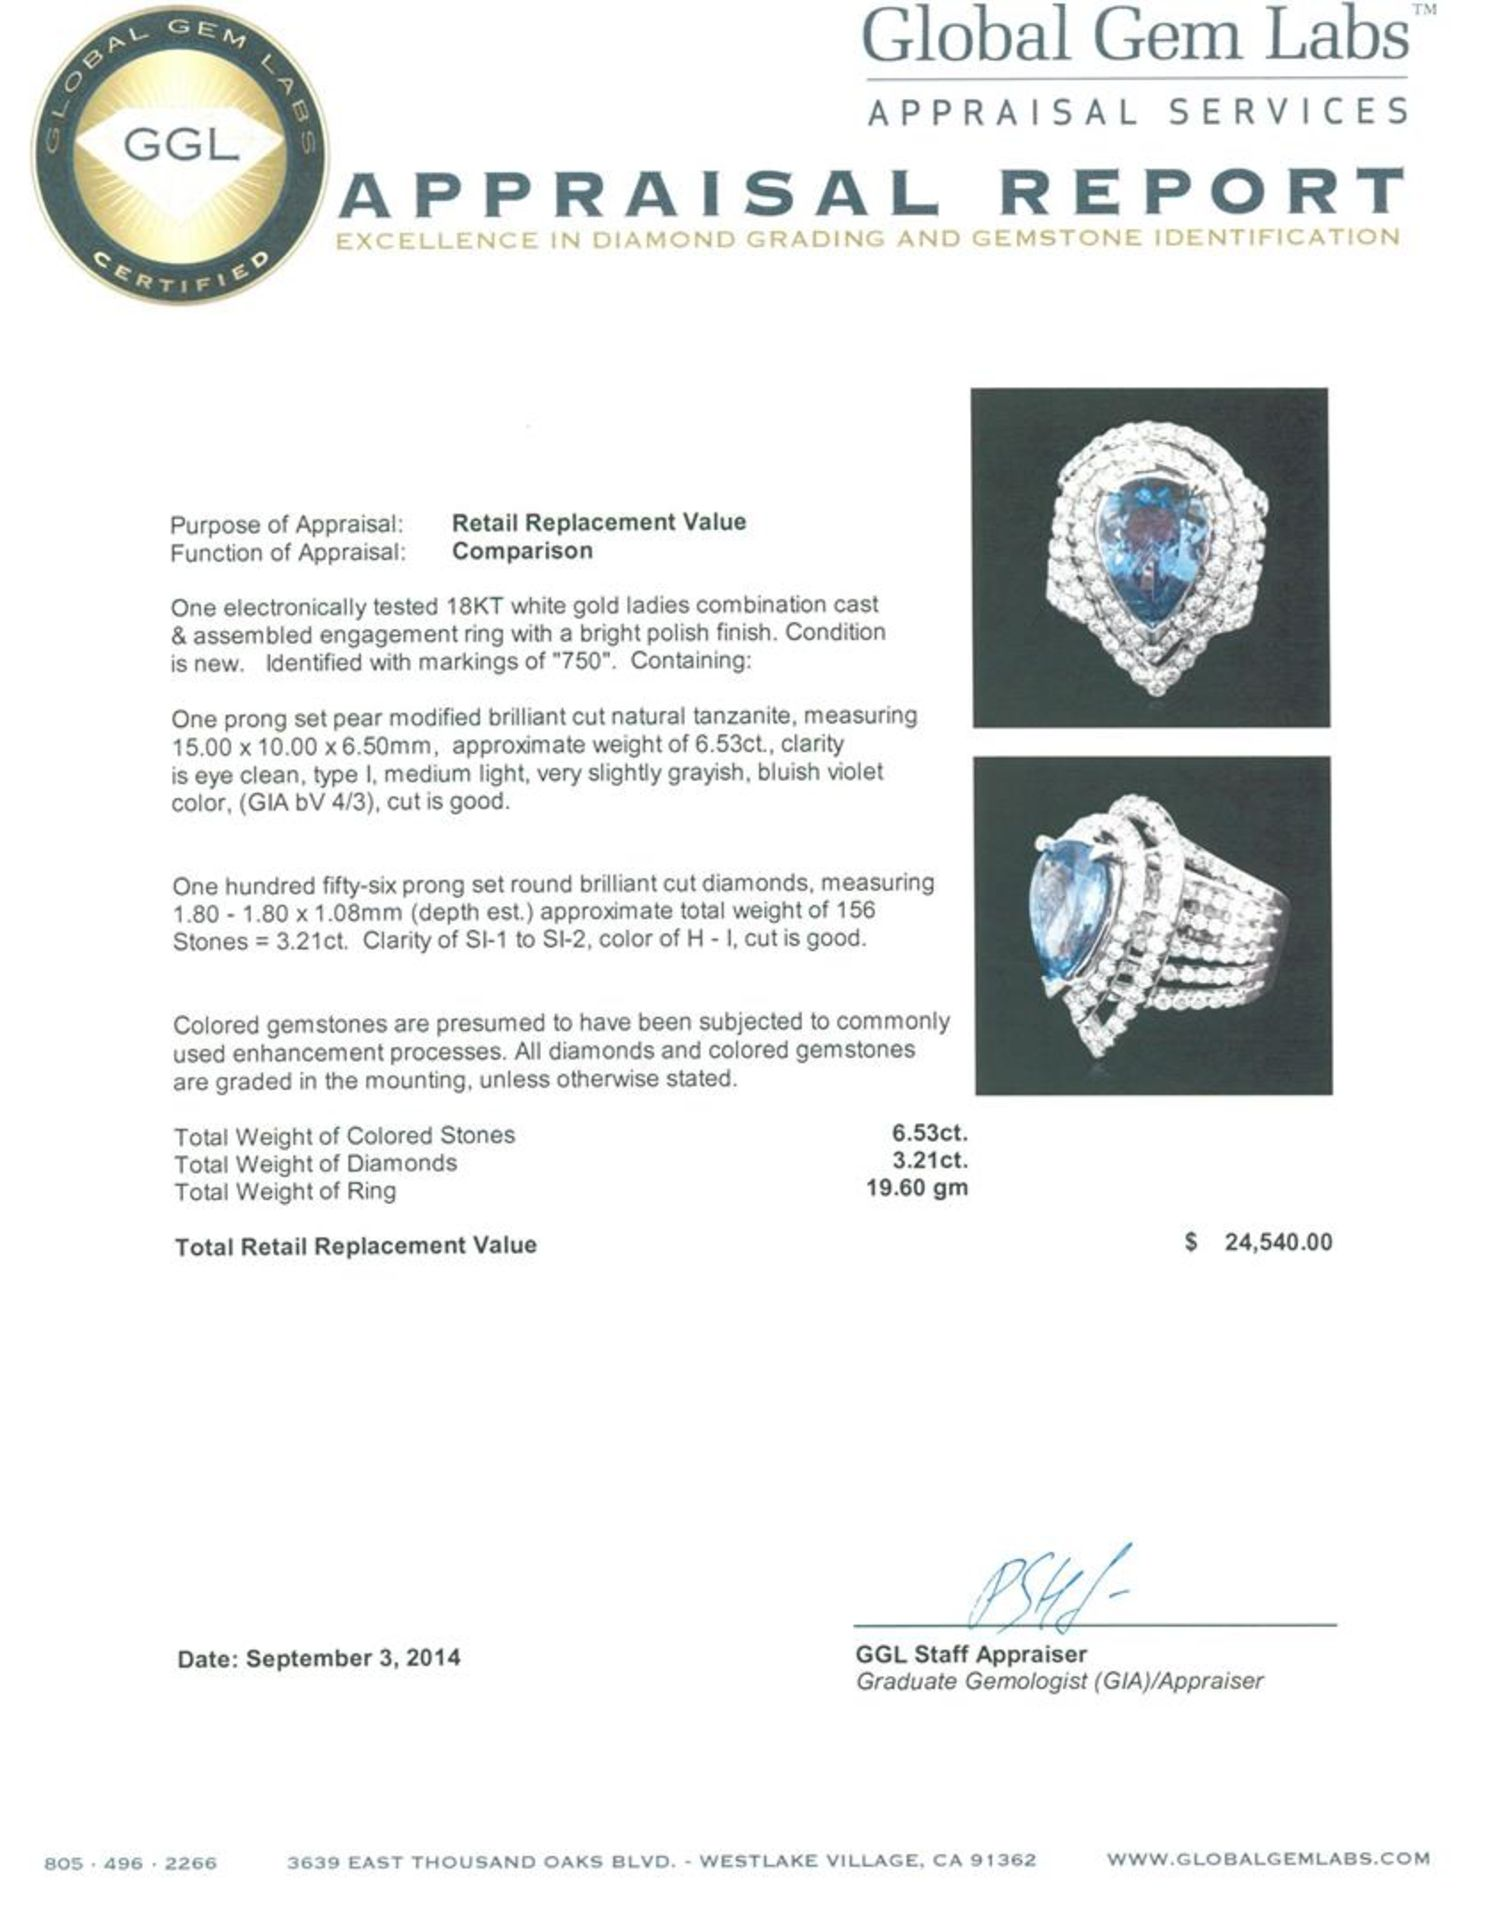 18KT White Gold 6.53 ctw Tanzanite and Diamond Ring - Image 3 of 3